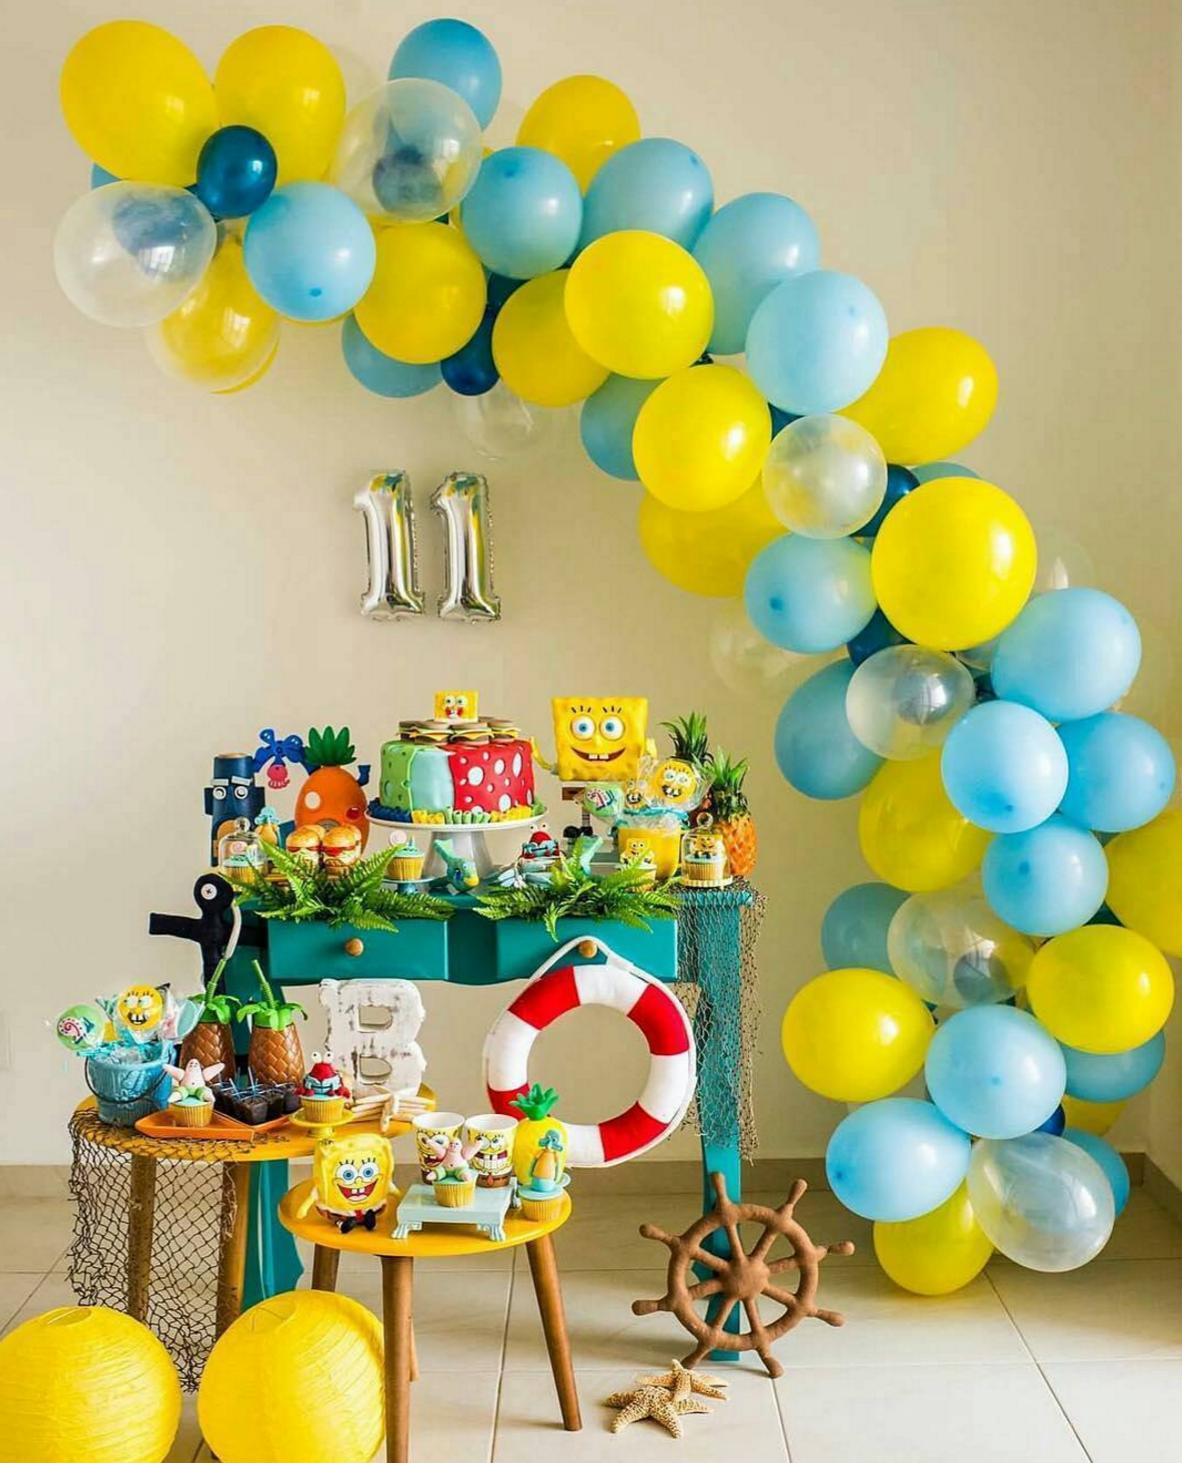 Sponge Bob's Birthday Party Decoration